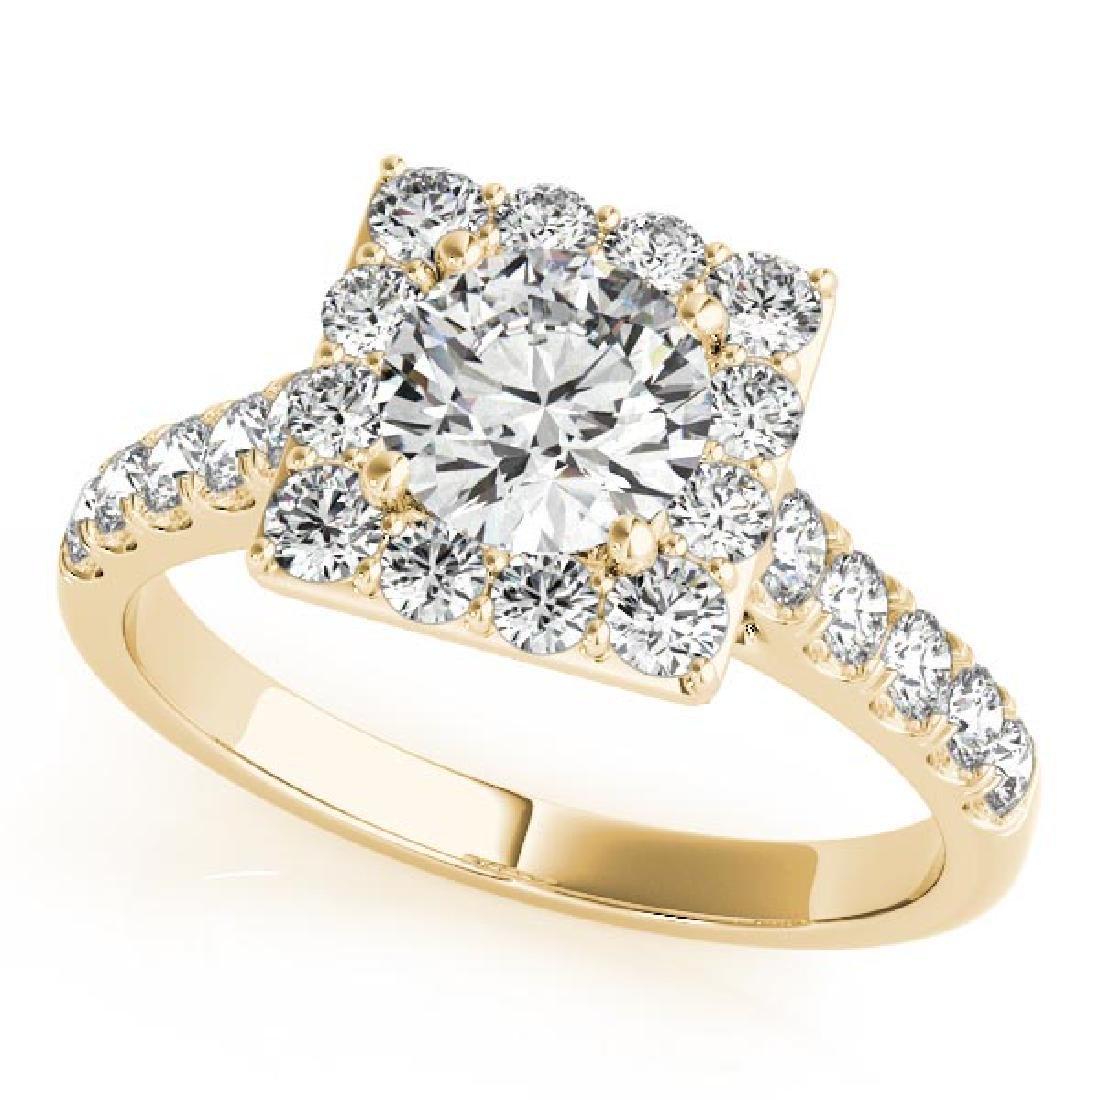 CERTIFIED 14KT WHITE GOLD 1.65 CT G-H/VS-SI1 DIAMOND HA